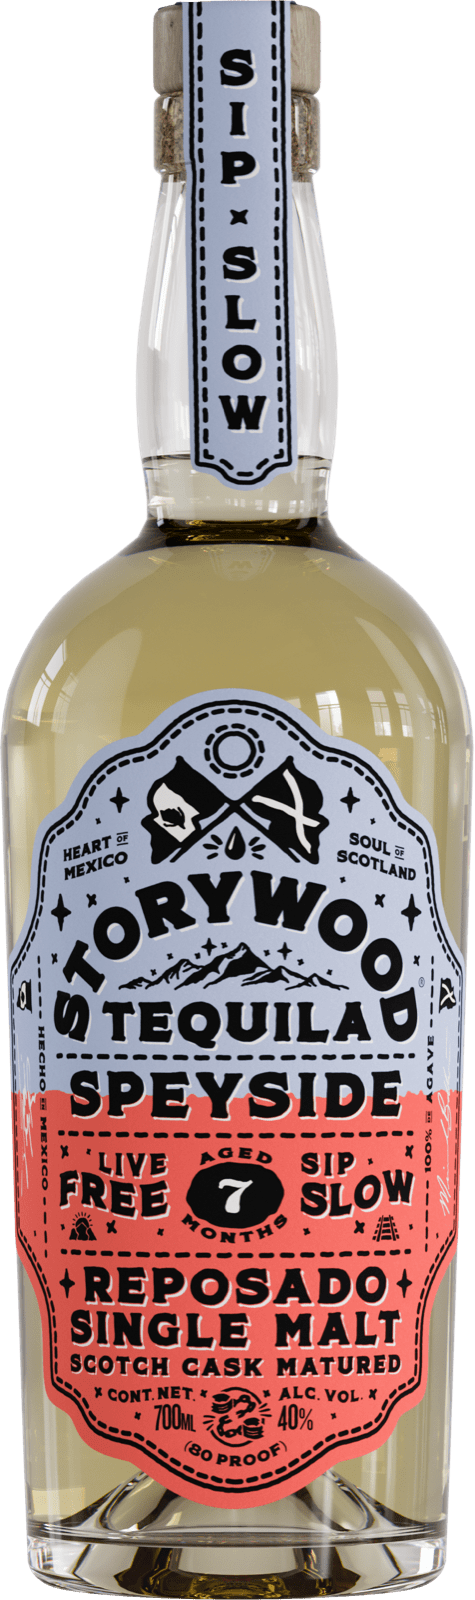 Storywood Speyside 7 reposado tequila